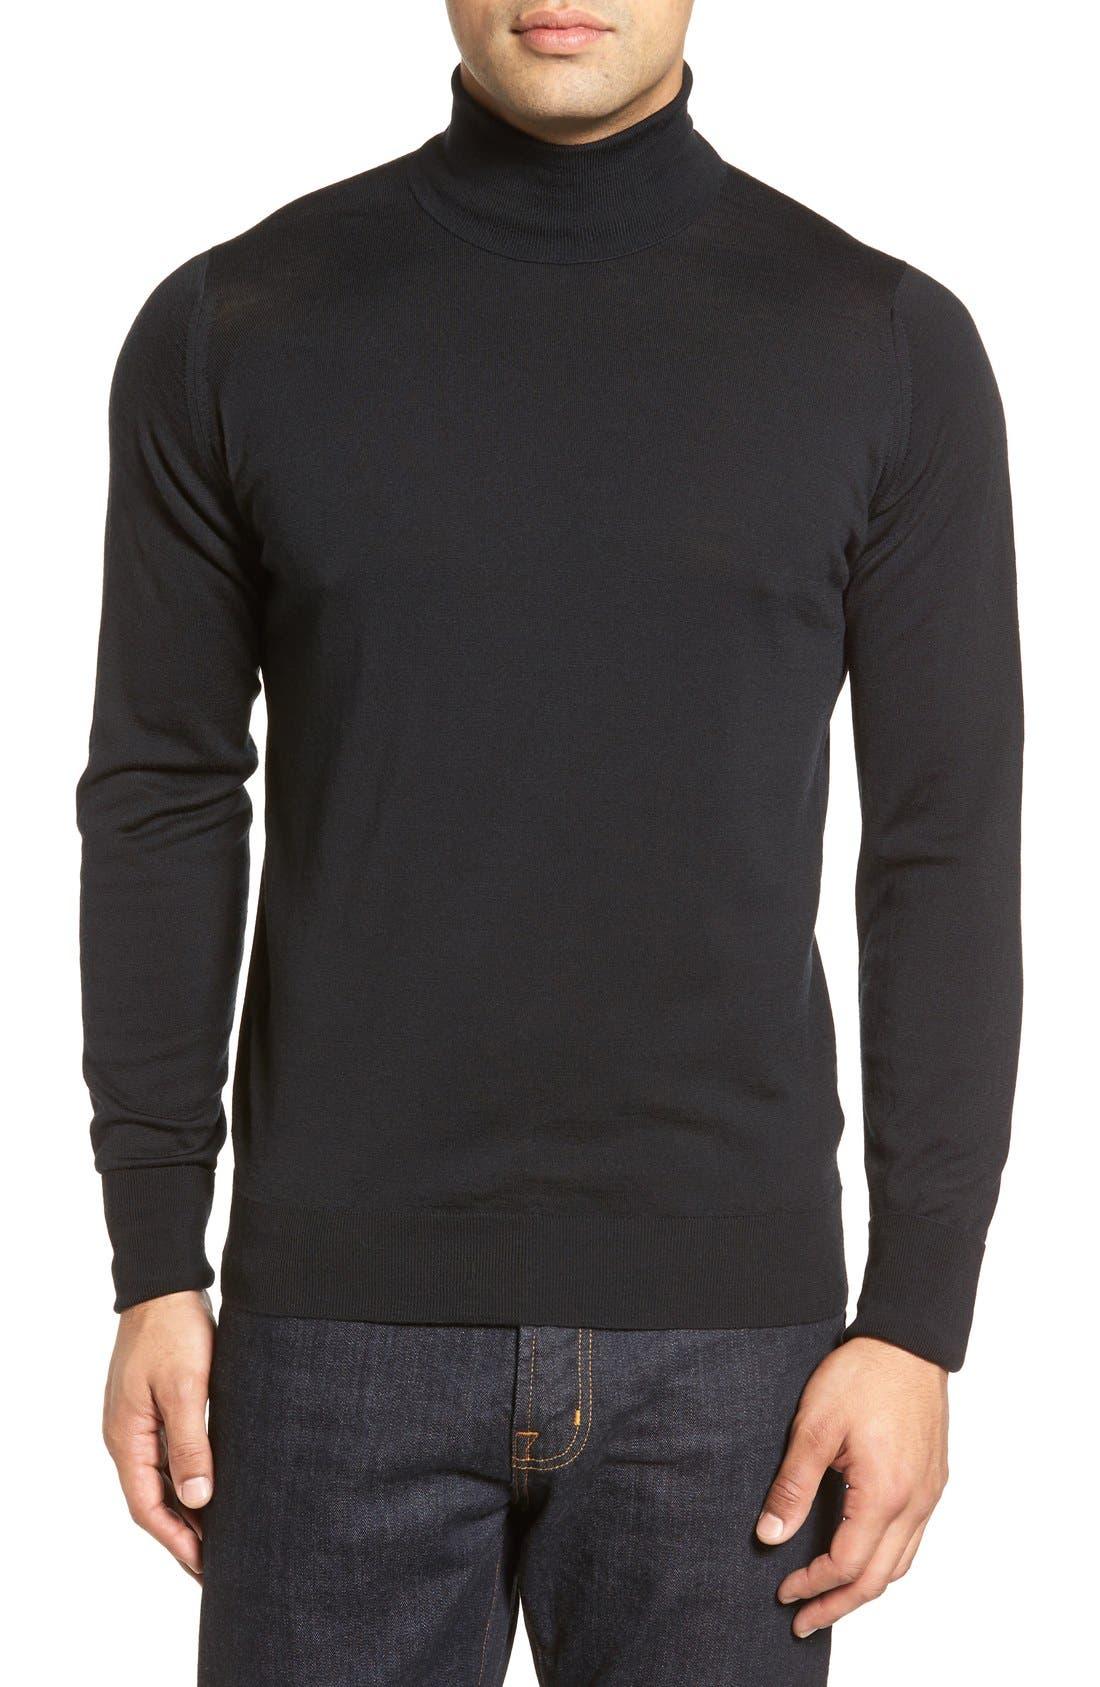 John Smedley 'Richards' Easy Fit Turtleneck Wool Sweater